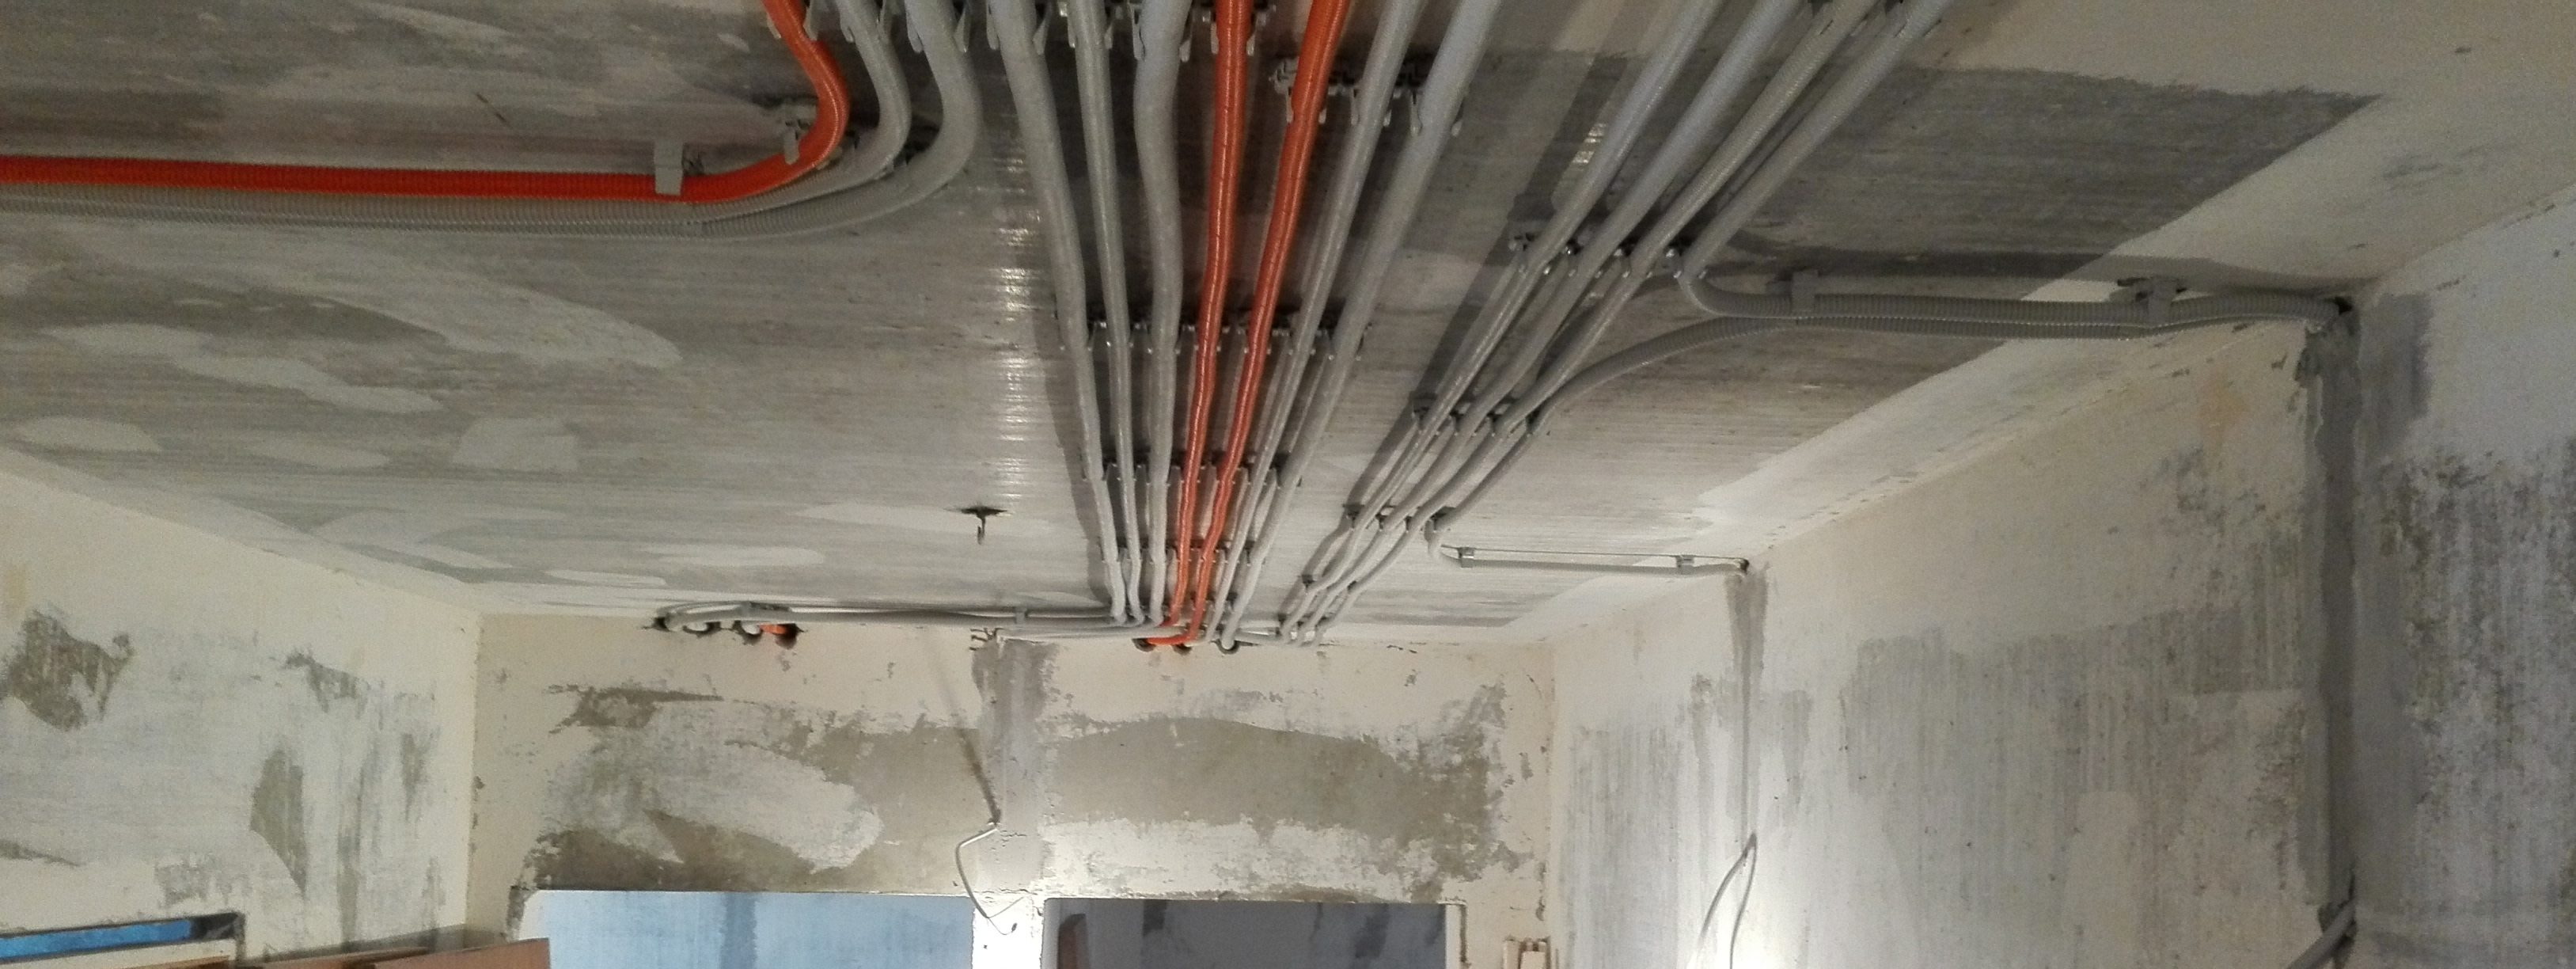 Правила прокладки электрики в квартире